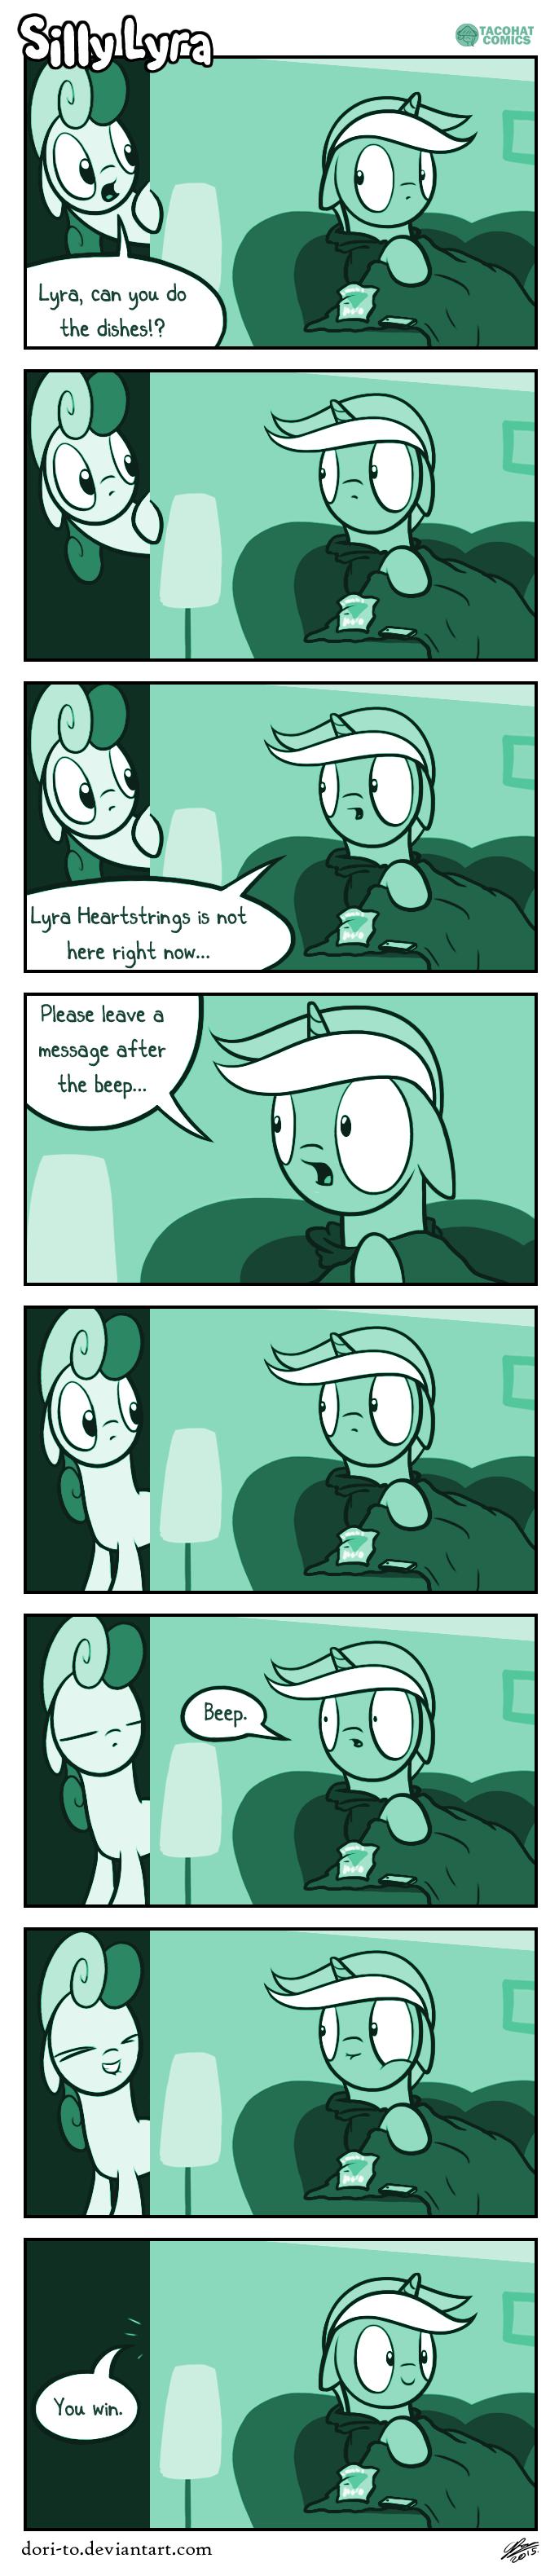 Silly Lyra - Communication Breakdown